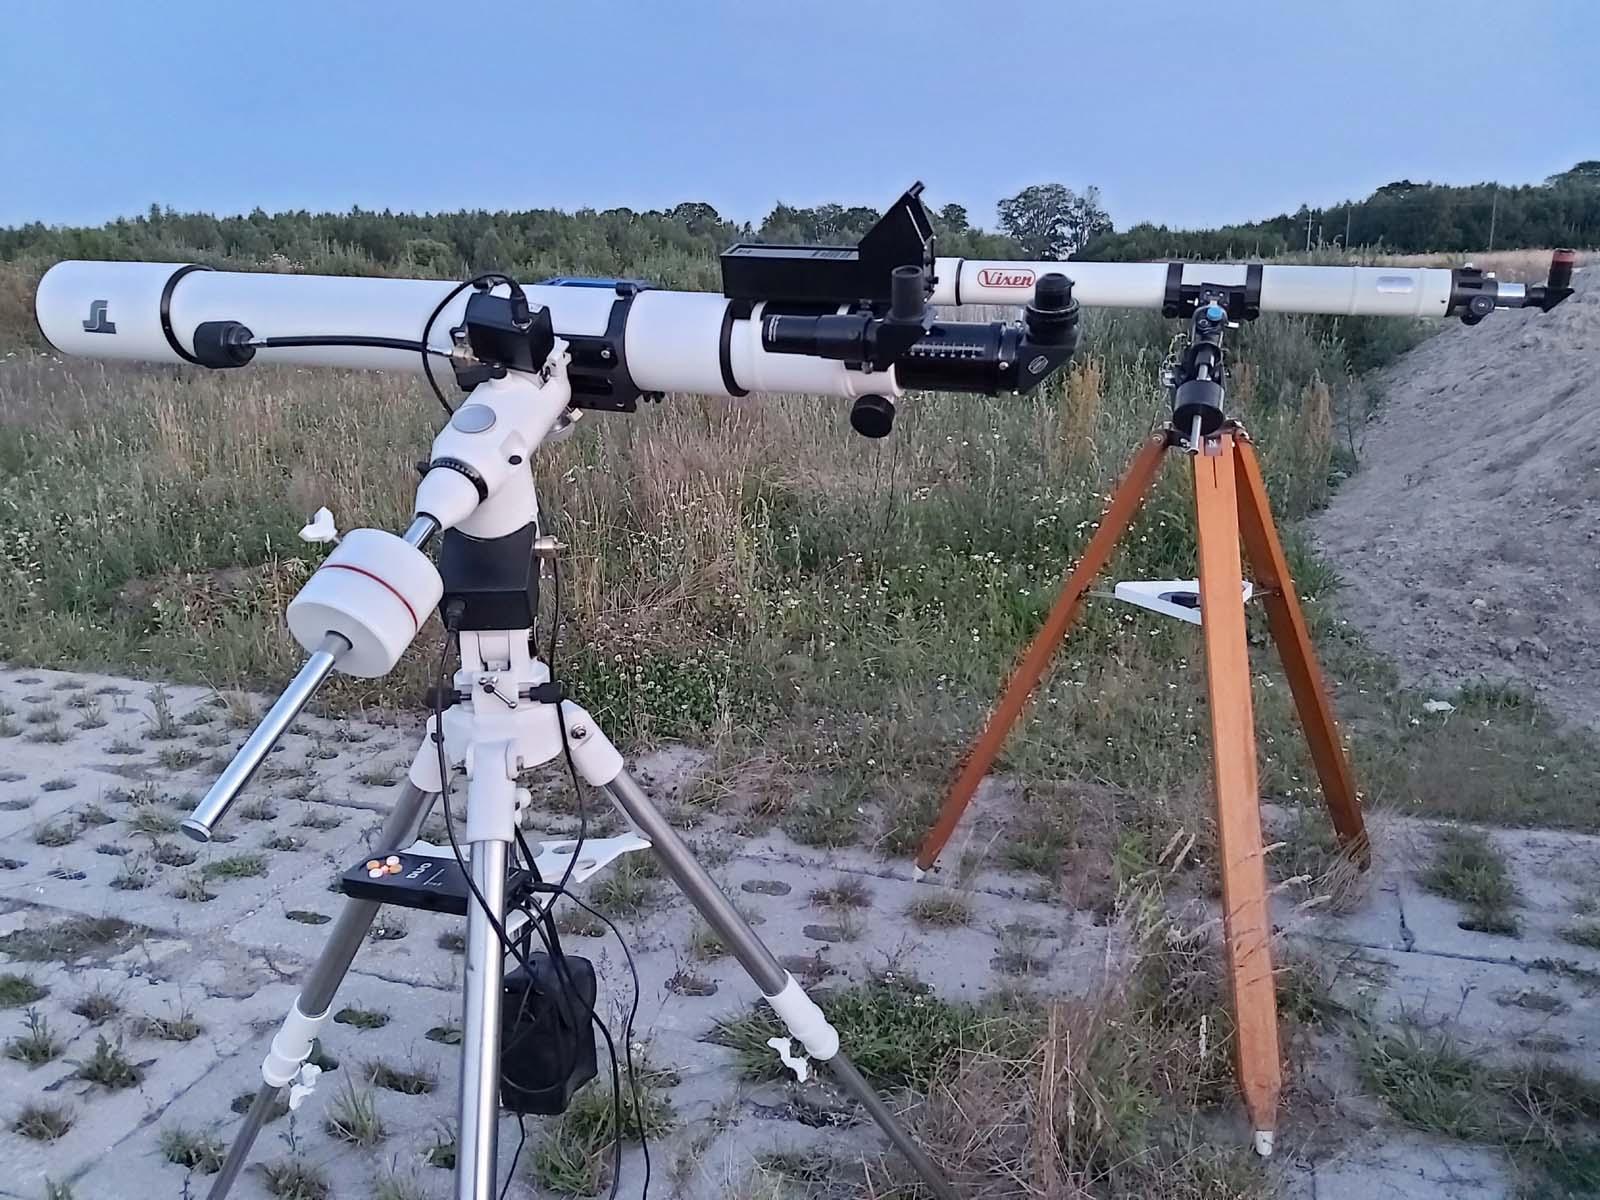 refraktory.jpeg.a47c6740b06a52d38d3d3fc69a14a4fd.jpeg